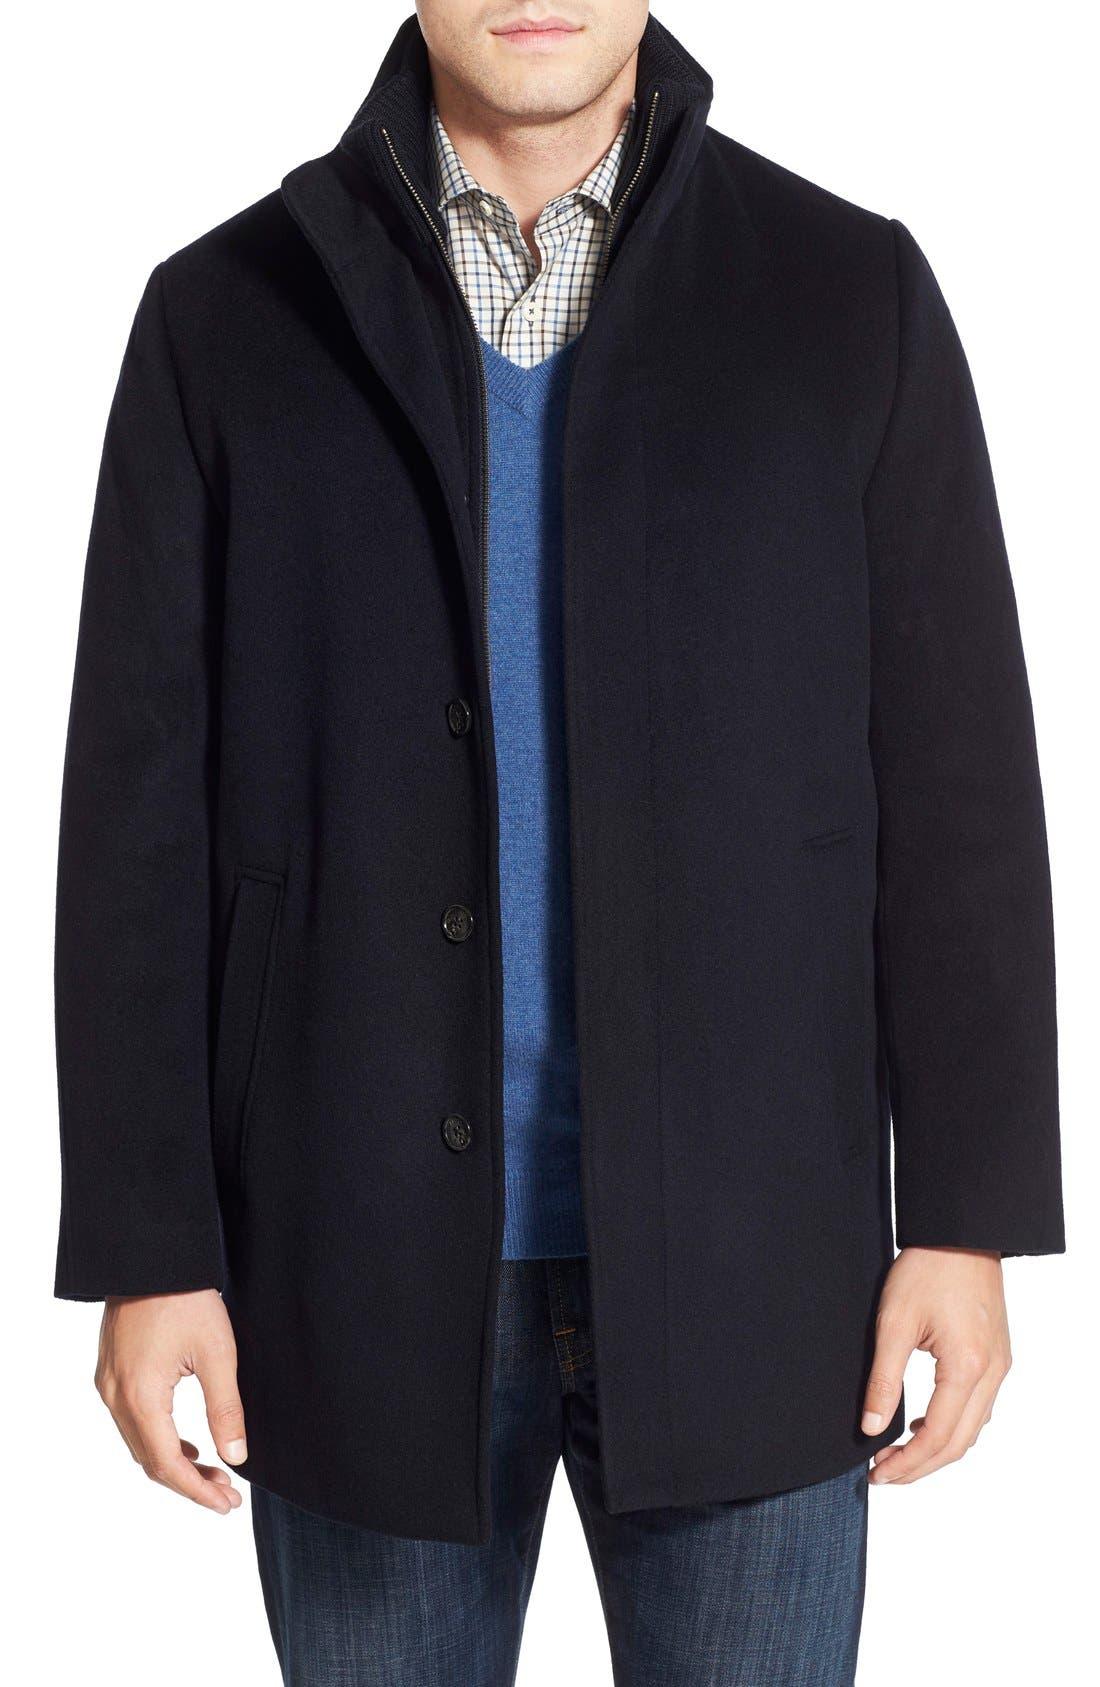 Alternate Image 1 Selected - Cardinal of Canada Wool Jacket